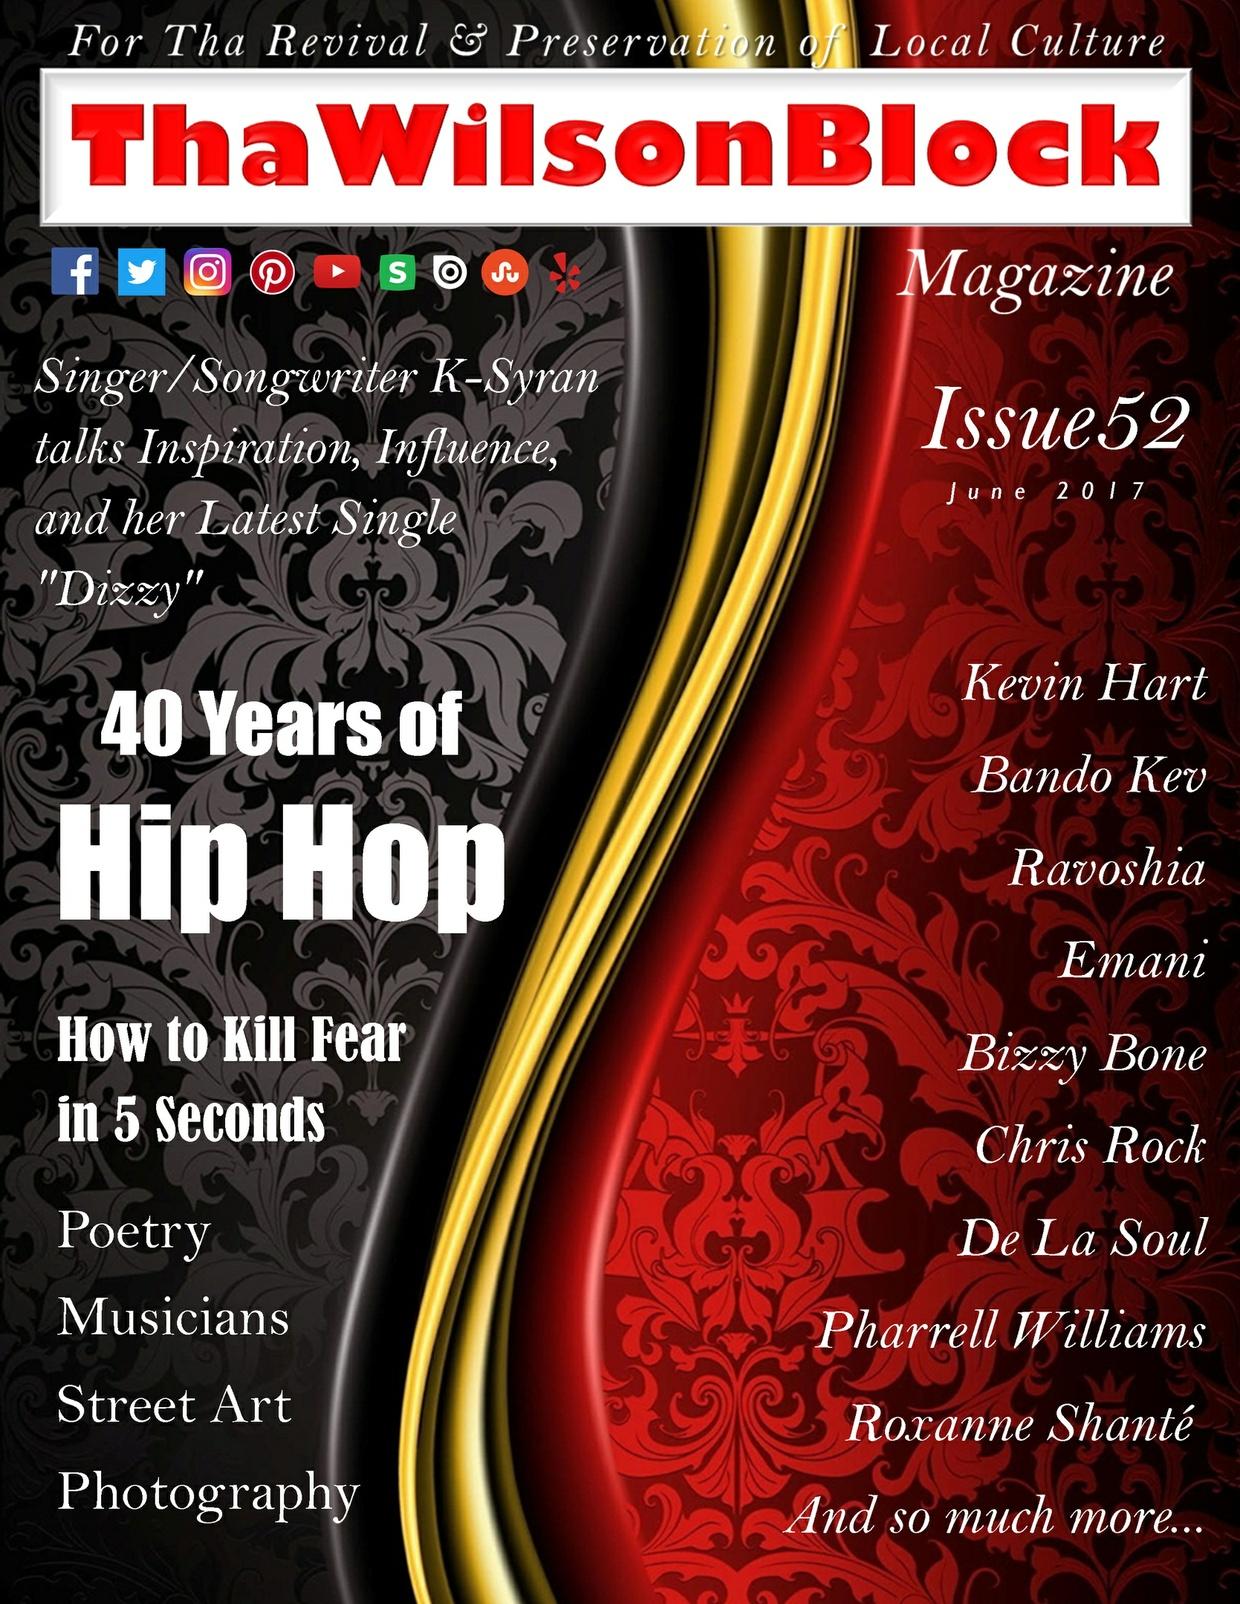 ThaWilsonBlock Magazine Issue52